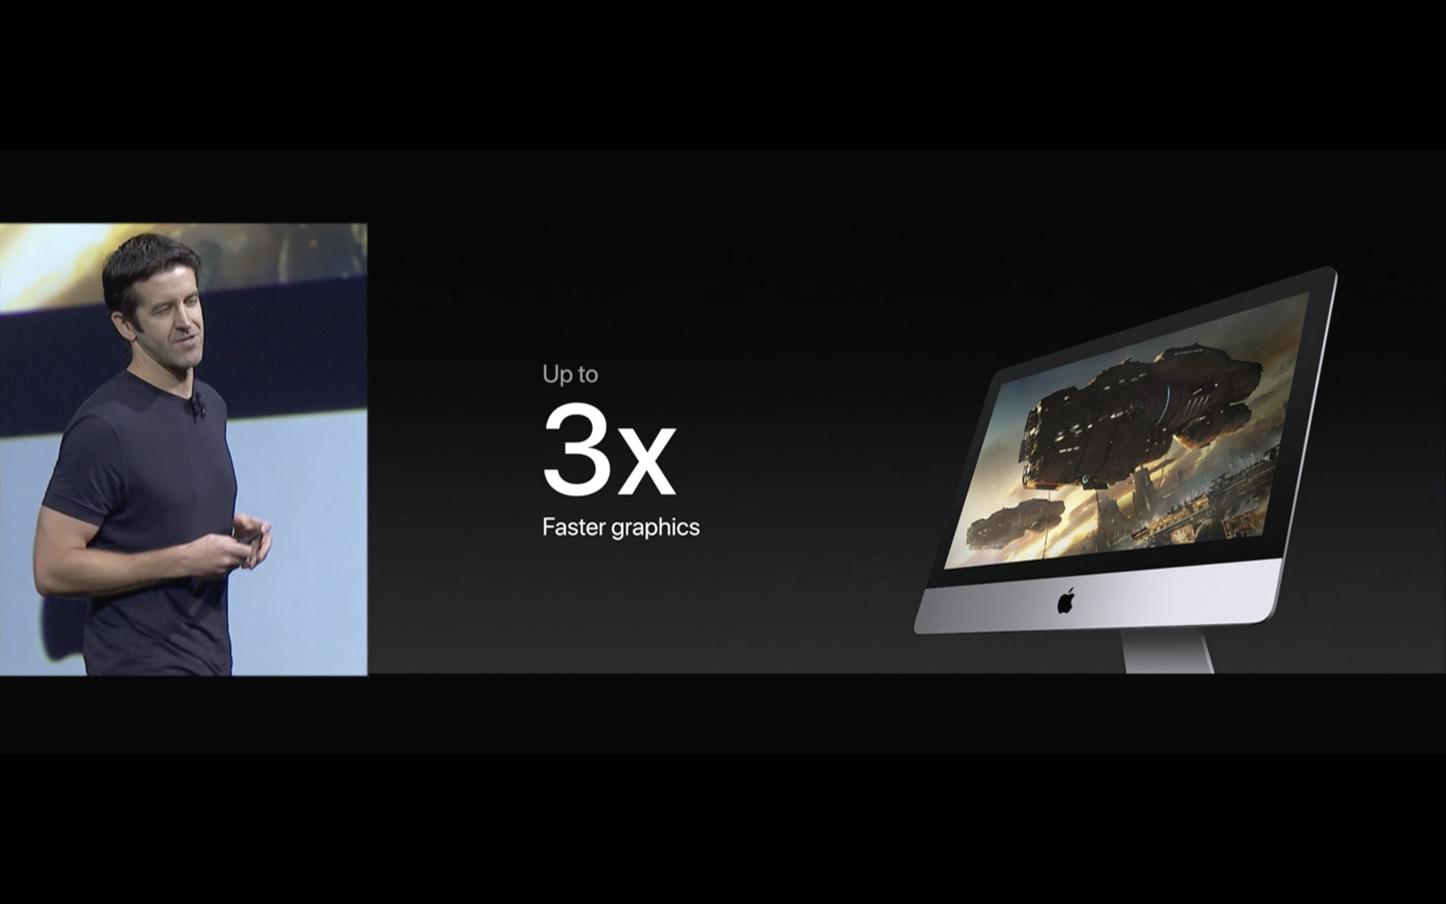 New-iMac-2017-WWDC17-14.png